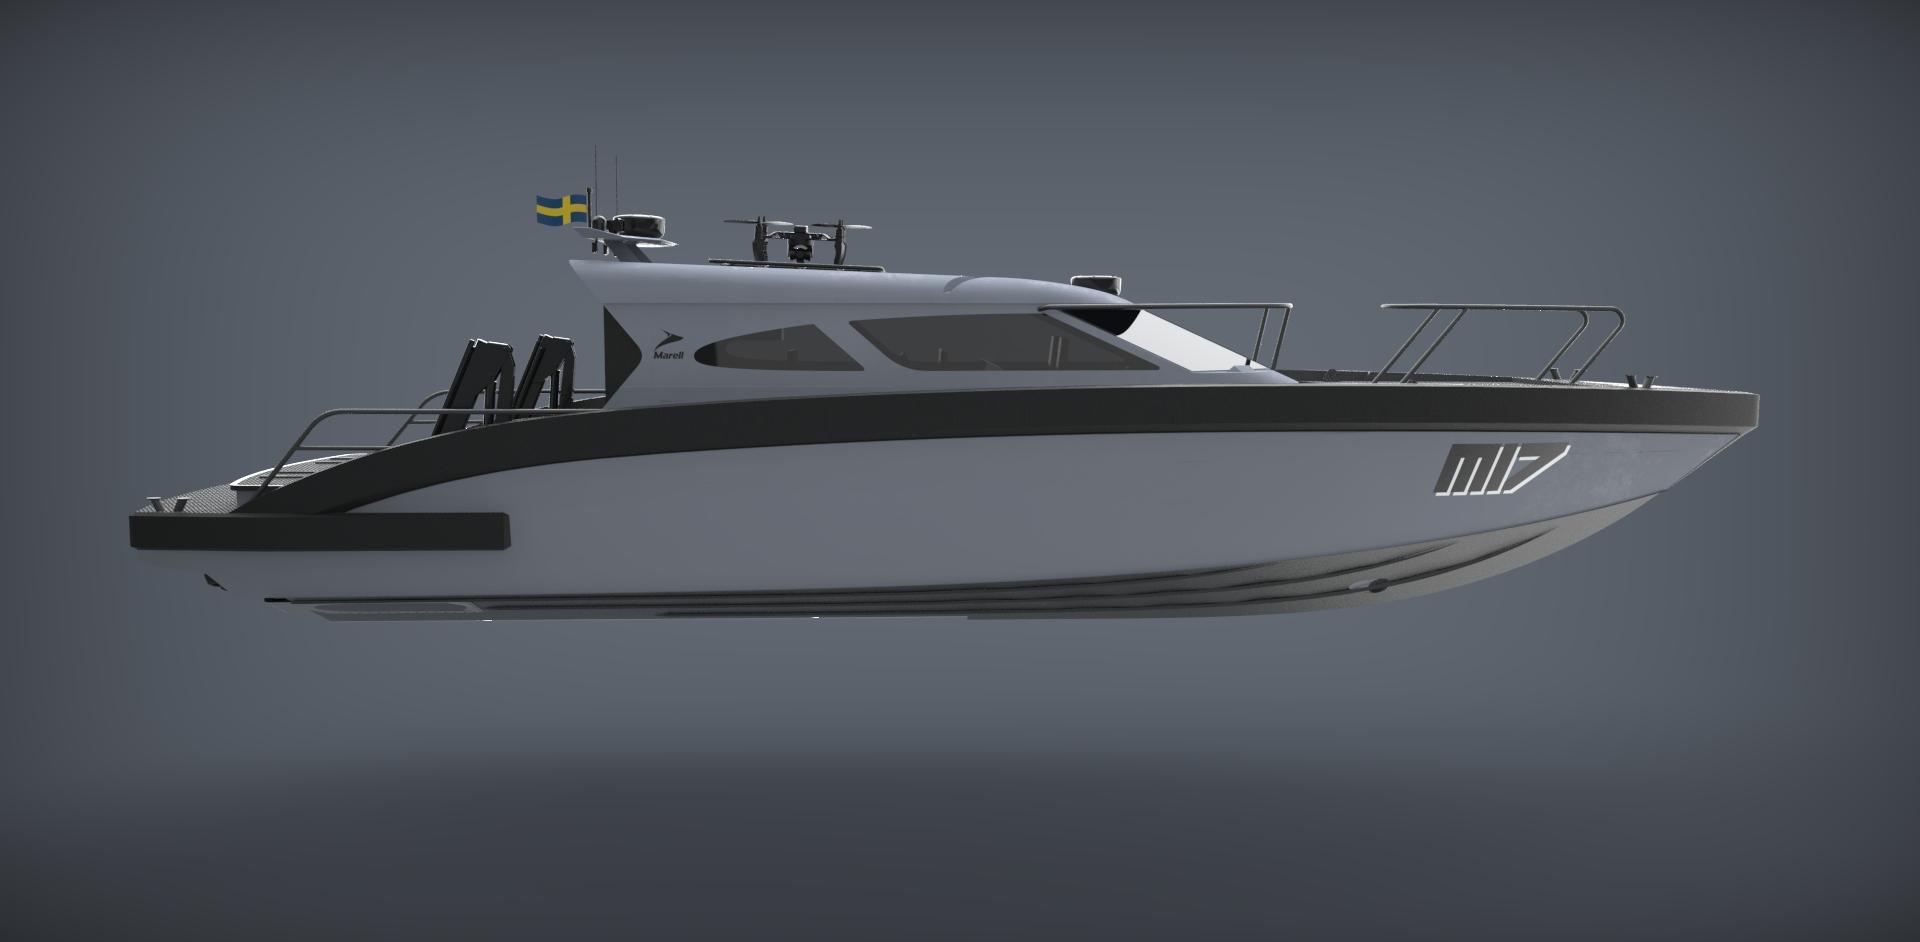 M17 patrol rendered boat model